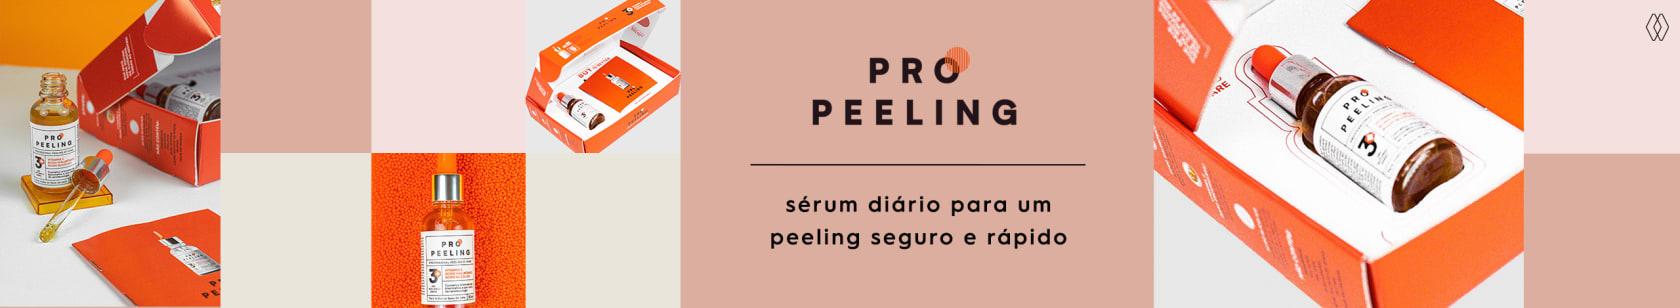 PRO PEELING | AMARO